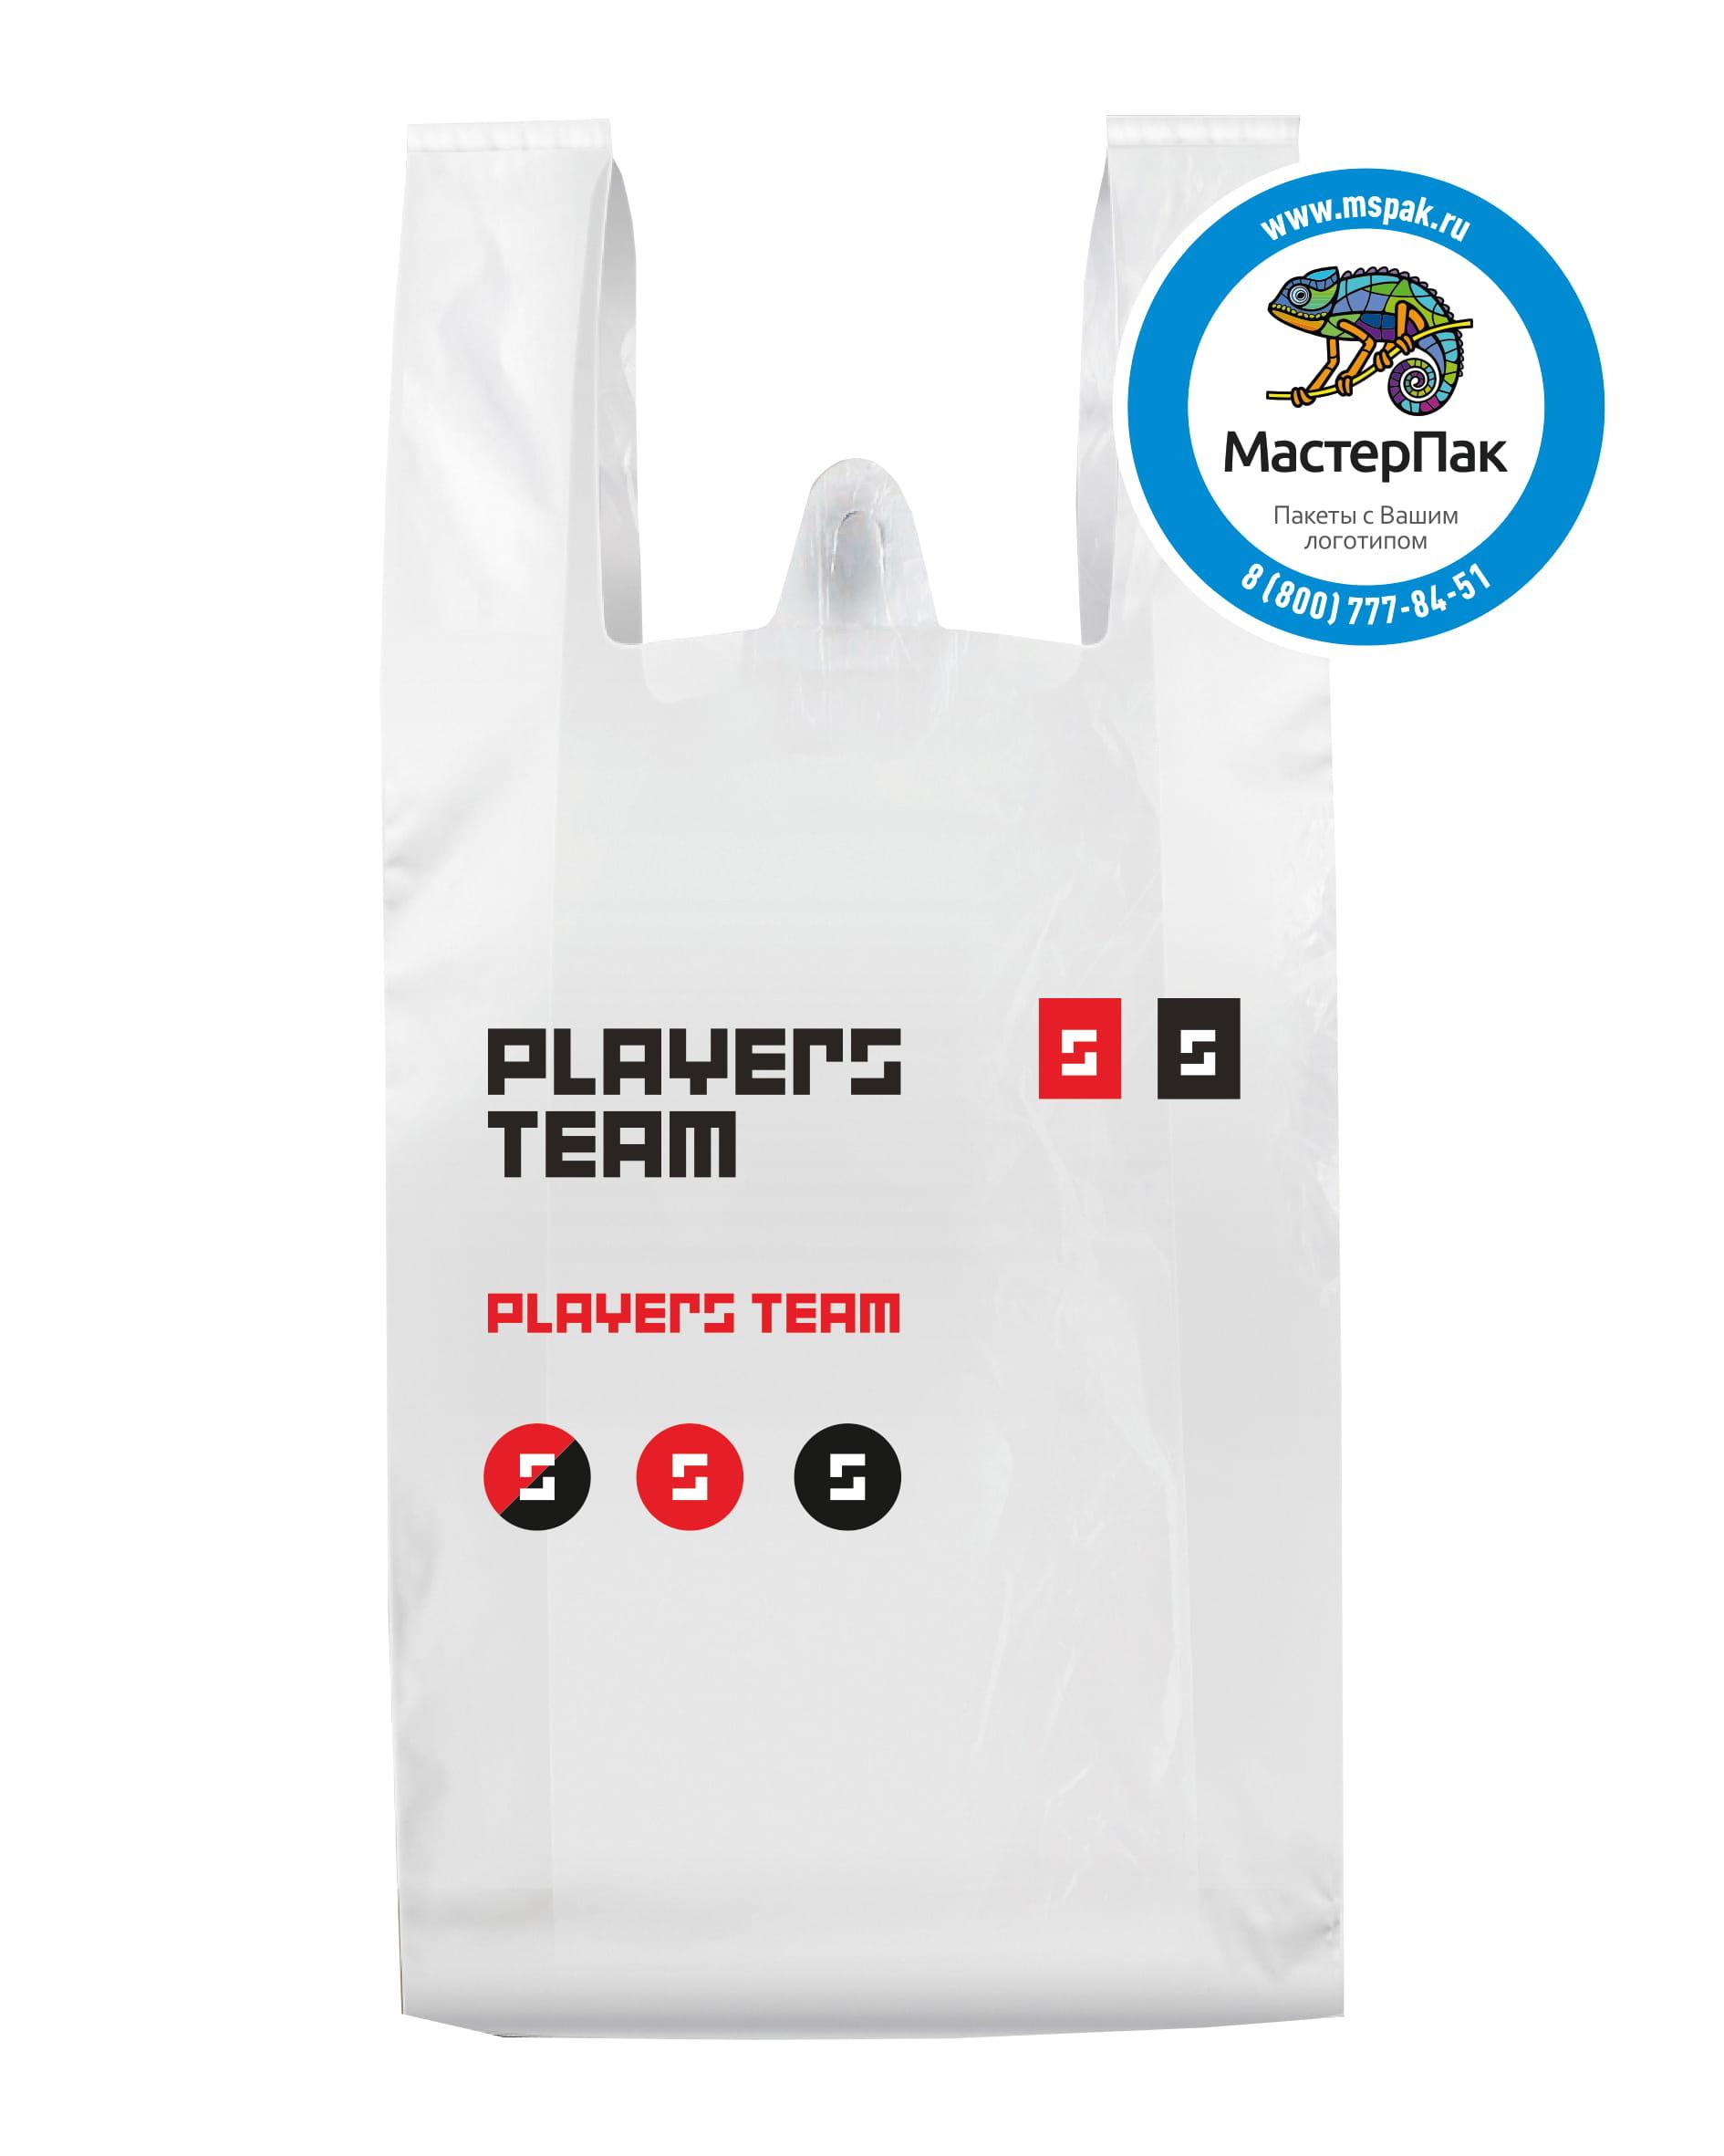 Пакет-майка ПНД с логотипом Players team, 30*60 см, 25 мкм, Москва